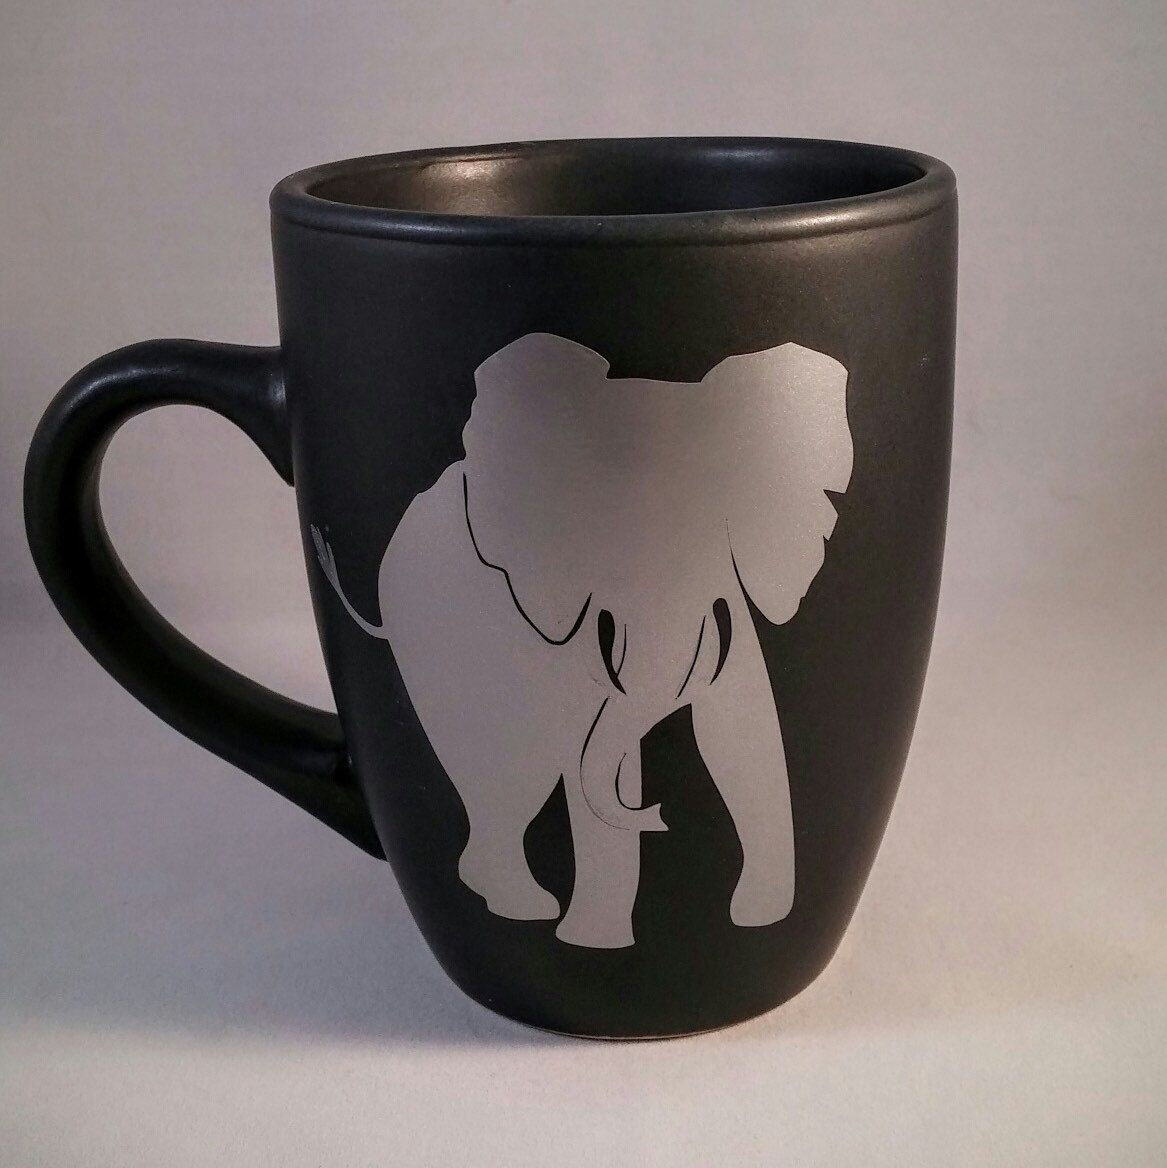 Elephant coffee mug matte black mug with matte silver